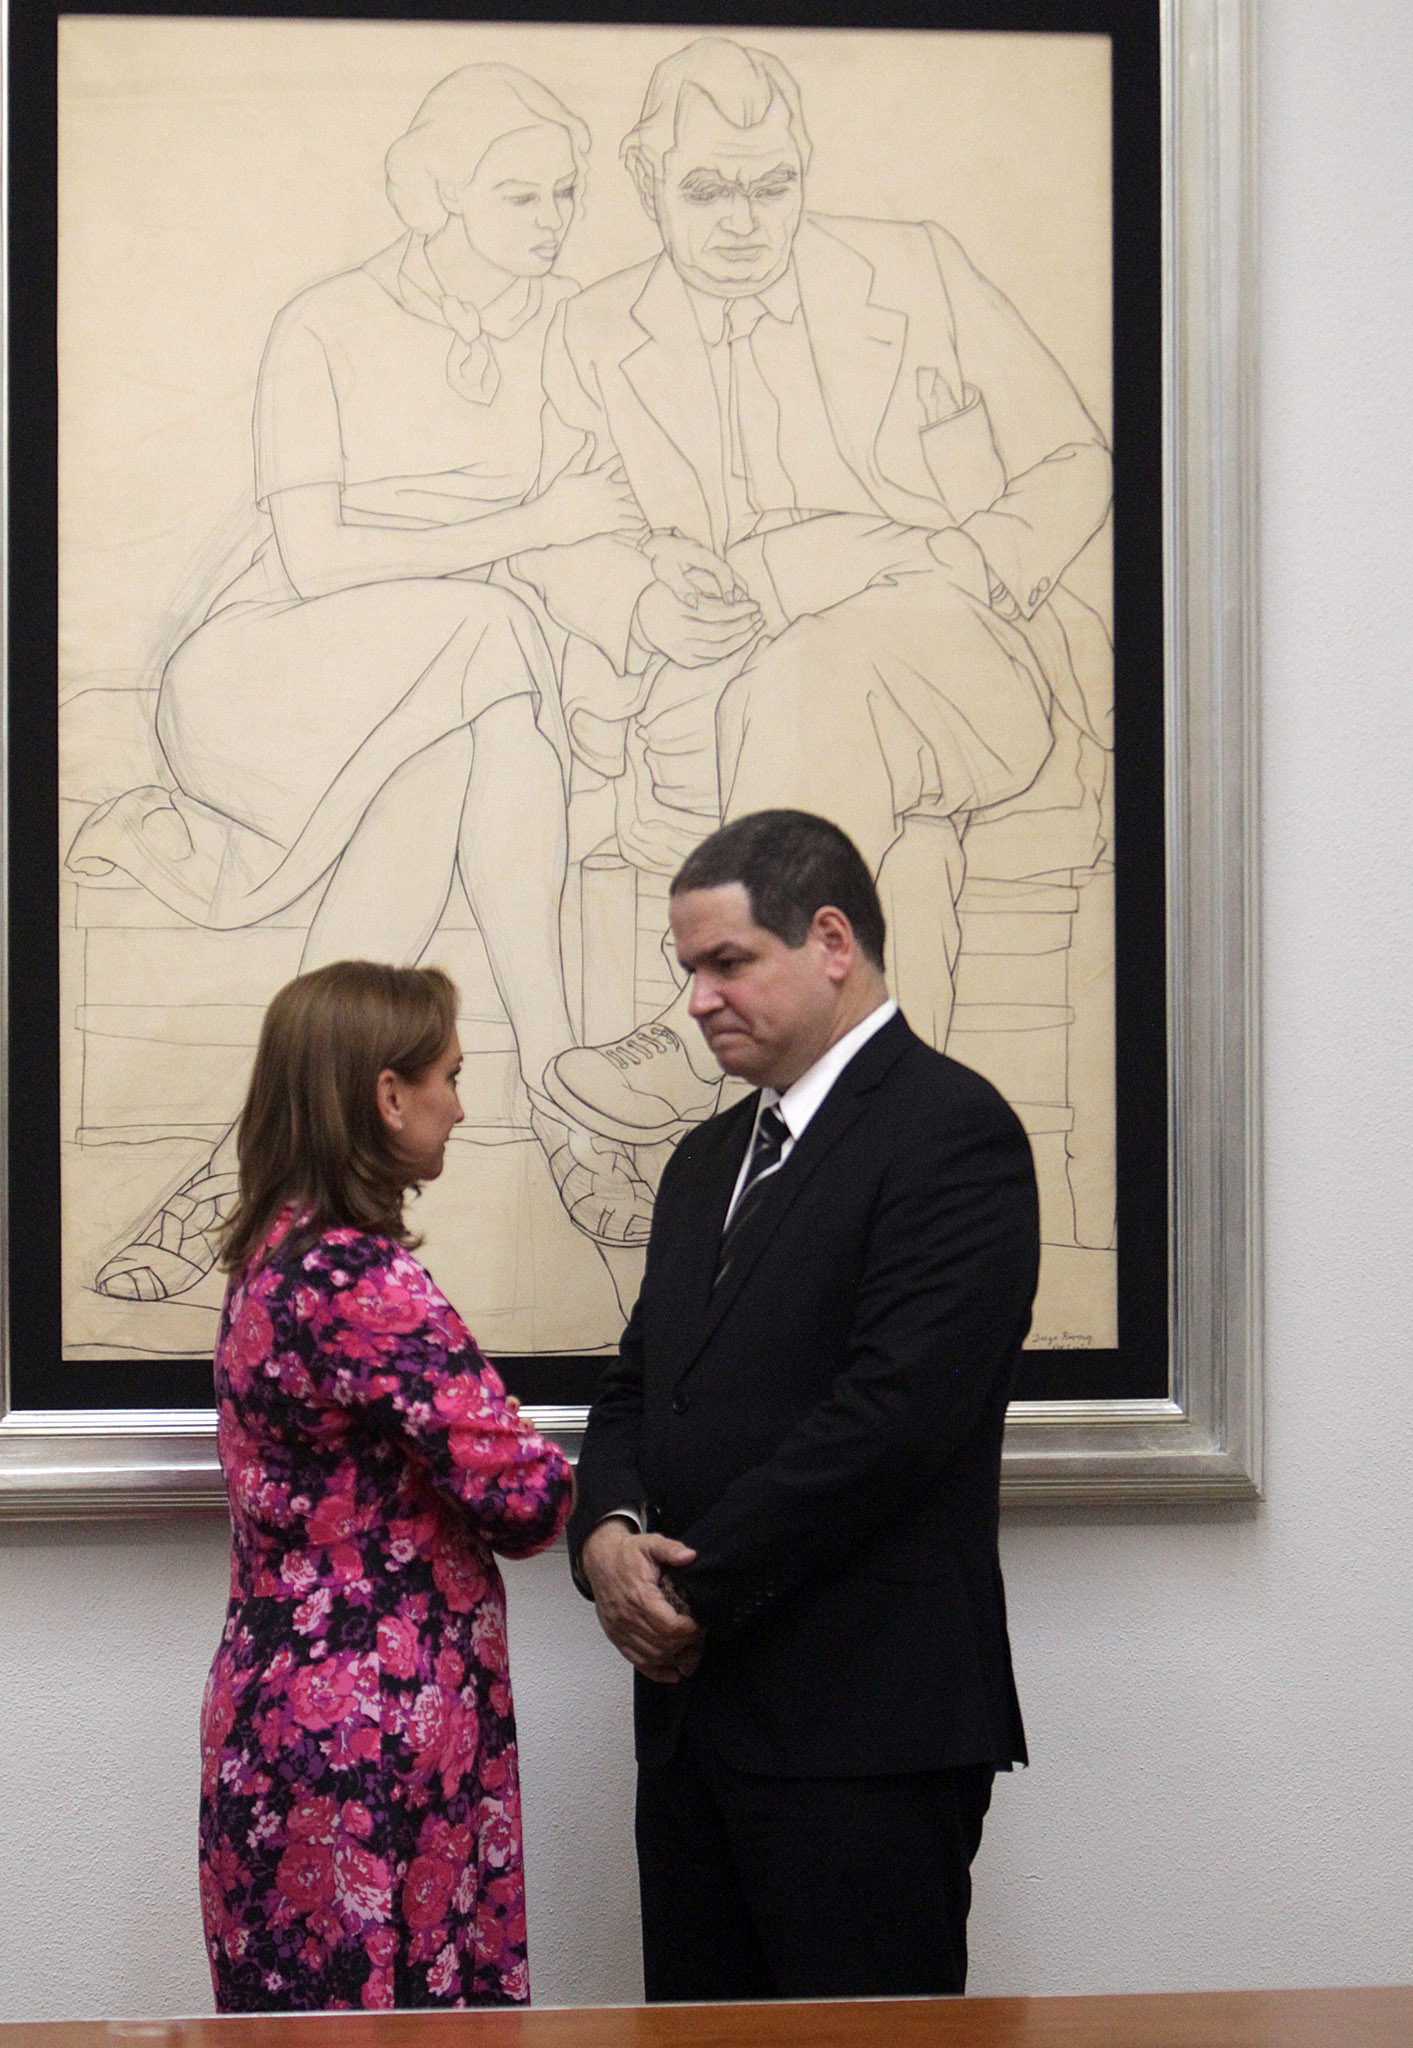 FOTO 2  La Canciller Claudia Ruiz Massieu  con el Presidente de la Comisi n de Pol tica Exterior  Soberan a e Integraci n de la Asamblea Nacional  Luis Floridojpg